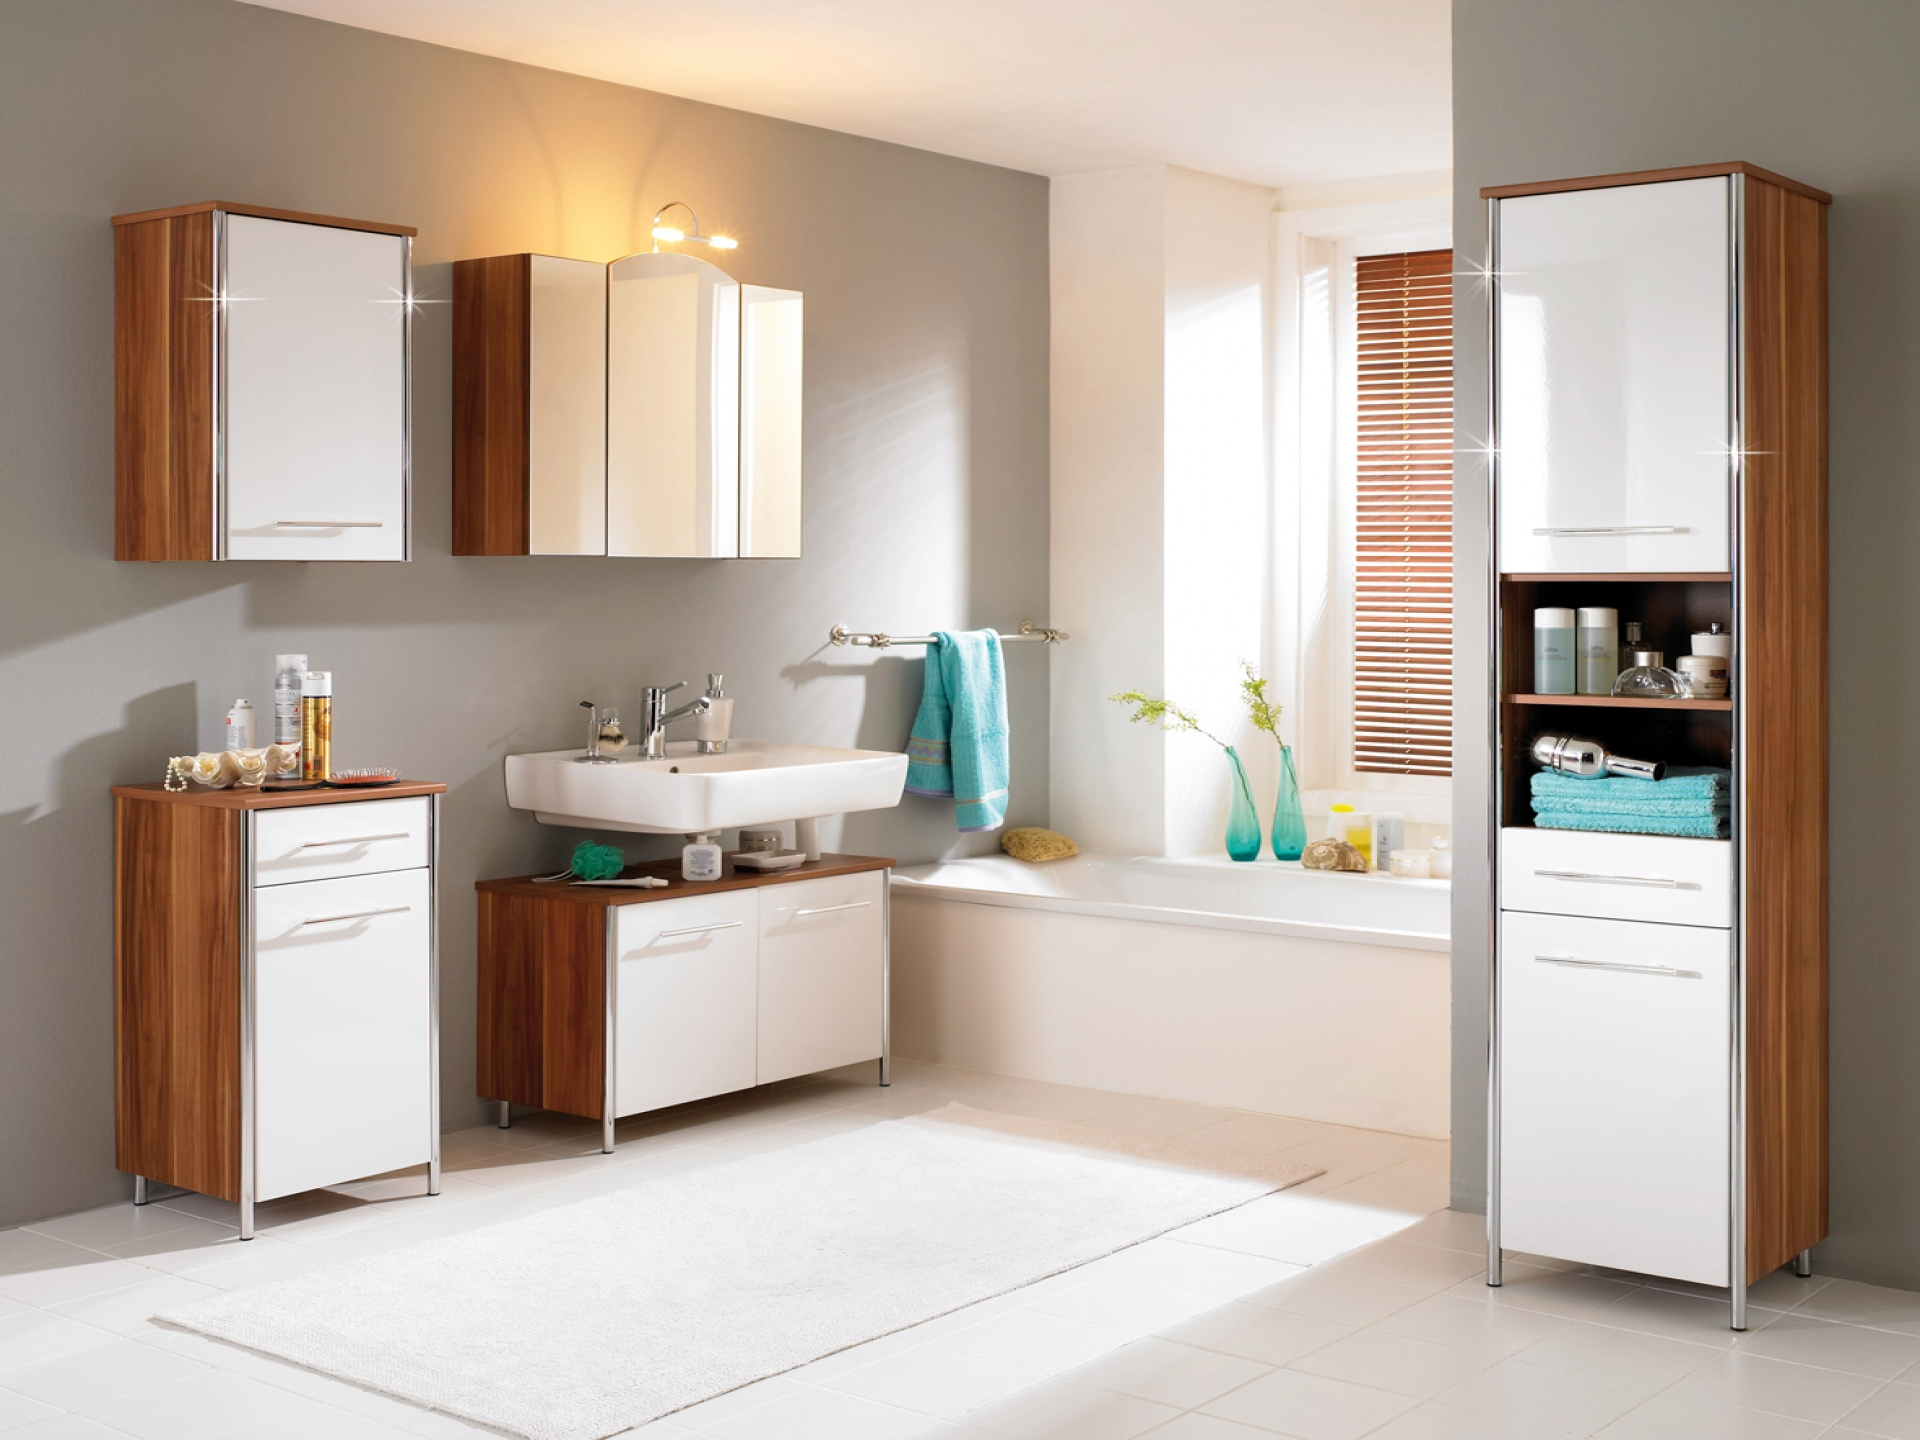 32 model kamar mandi hotel mewah minimalis terbaru 2017